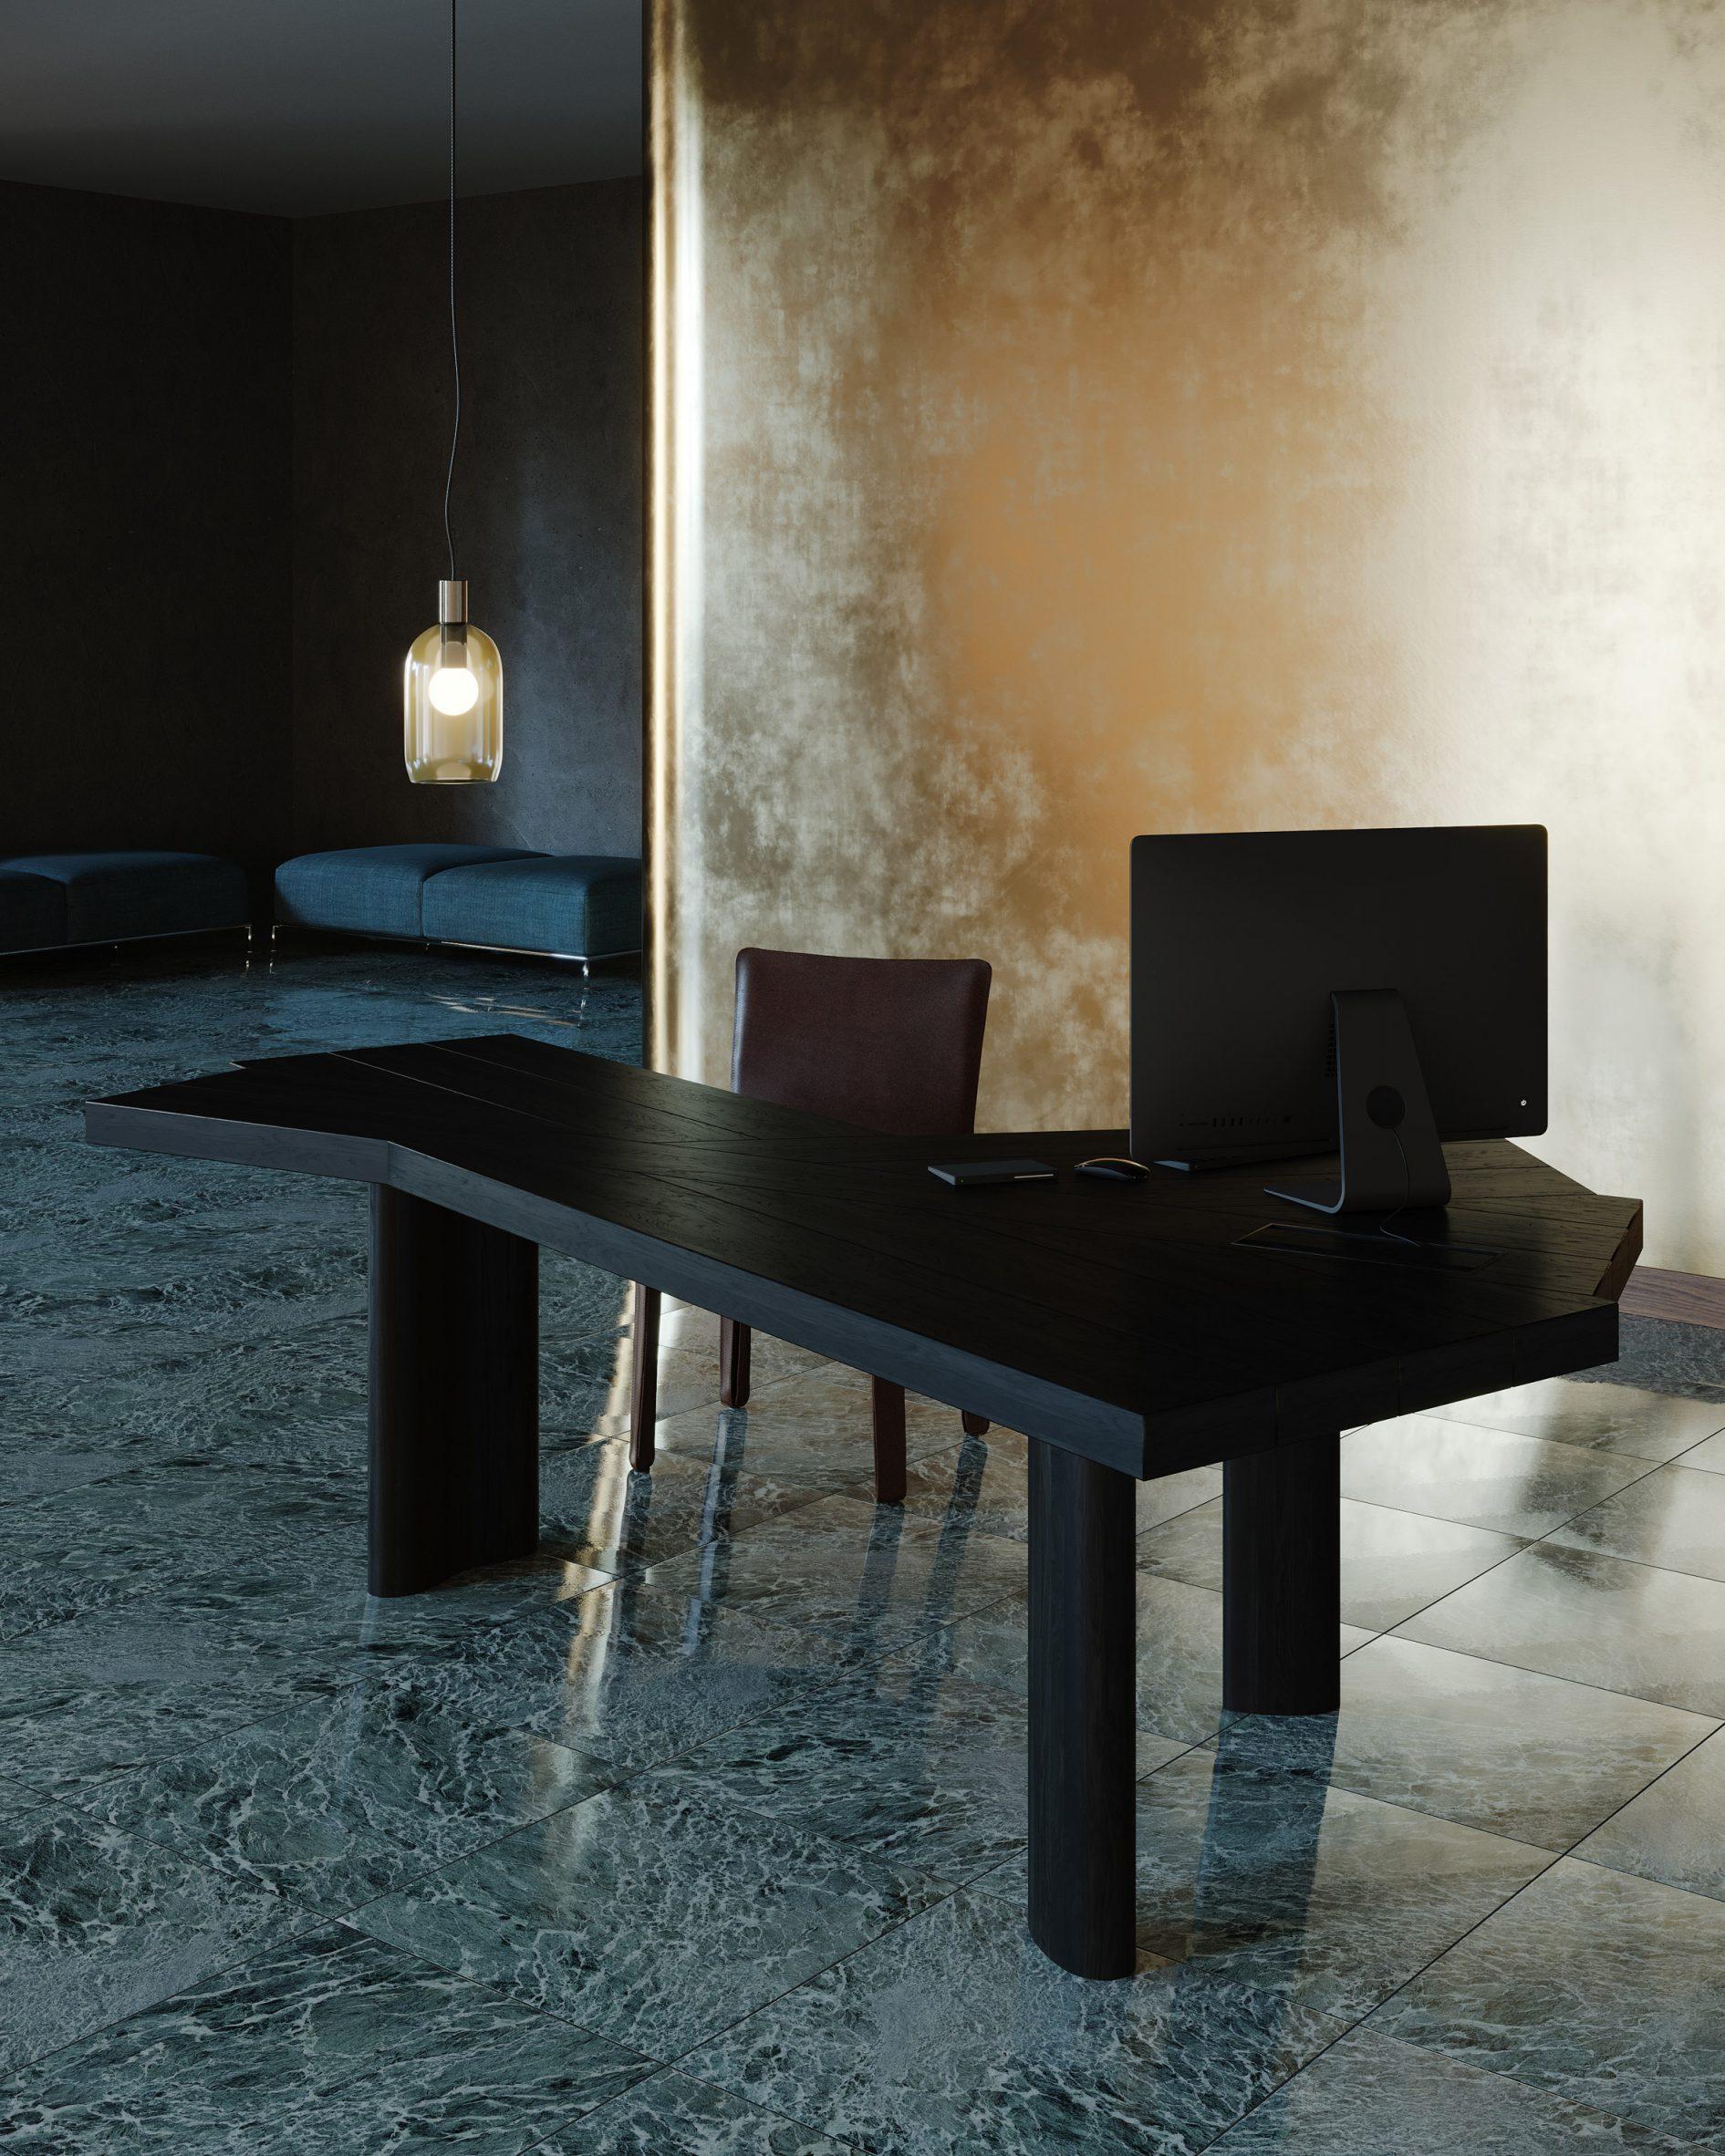 Ventaglio table by Charlotte Perriand for Cassina